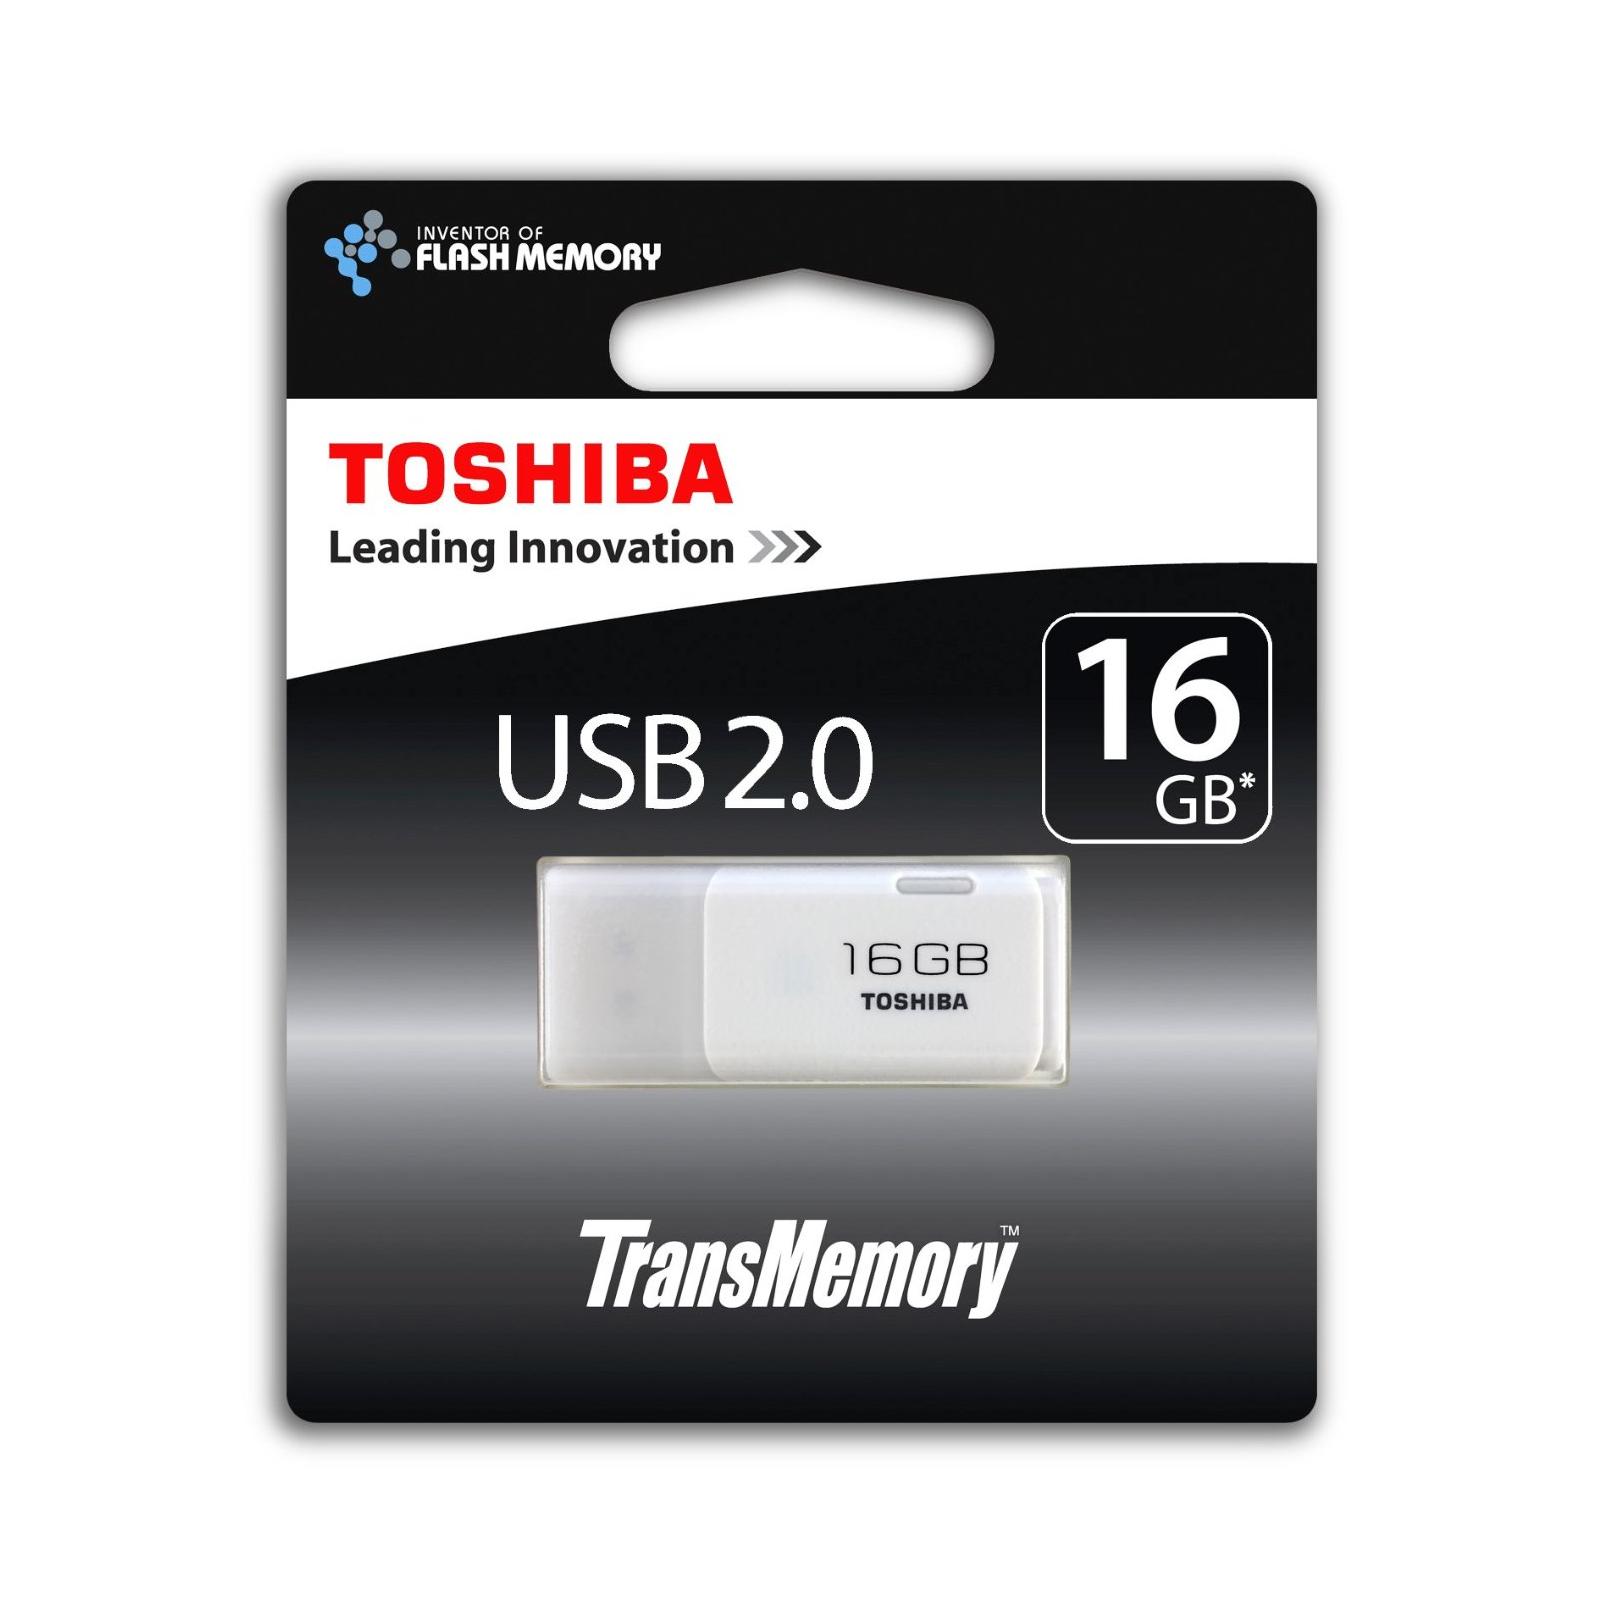 USB флеш накопитель TOSHIBA 16GB Hayabusa White USB 2.0 (THNU16HAYWHT(6)) изображение 3